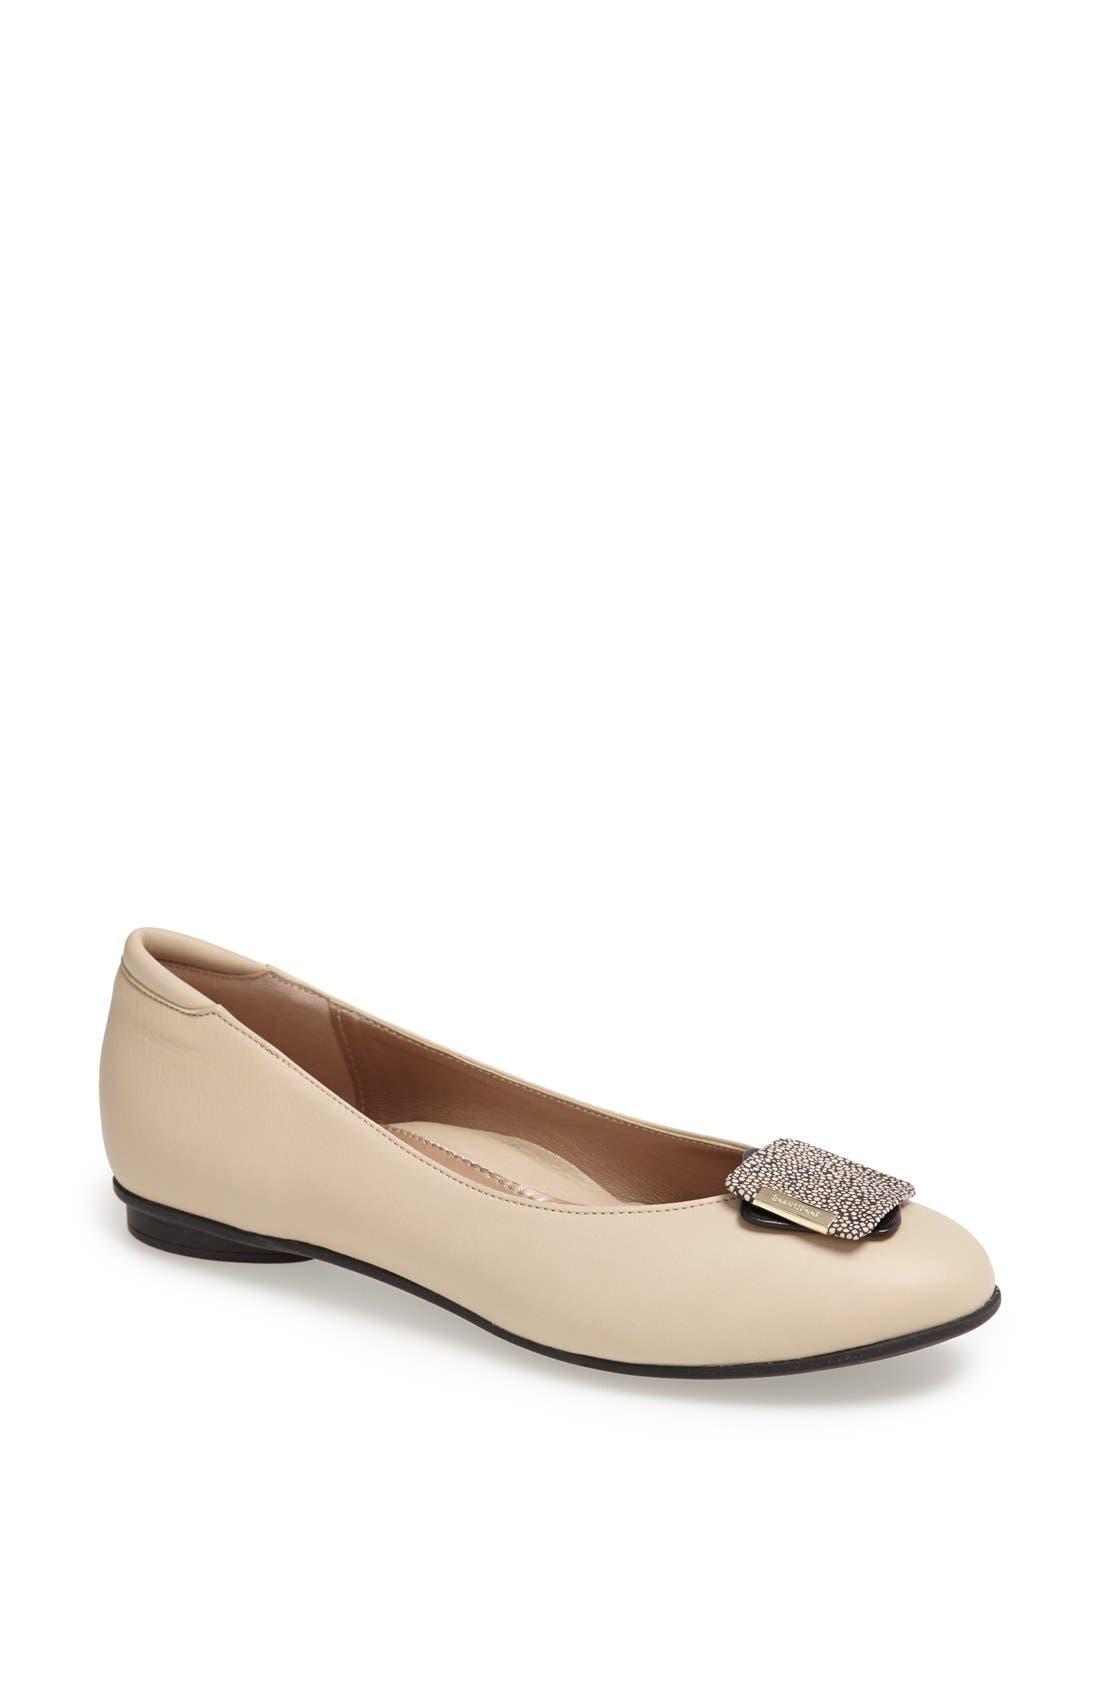 Alternate Image 1 Selected - BeautiFeel 'Shelly' Leather Flat